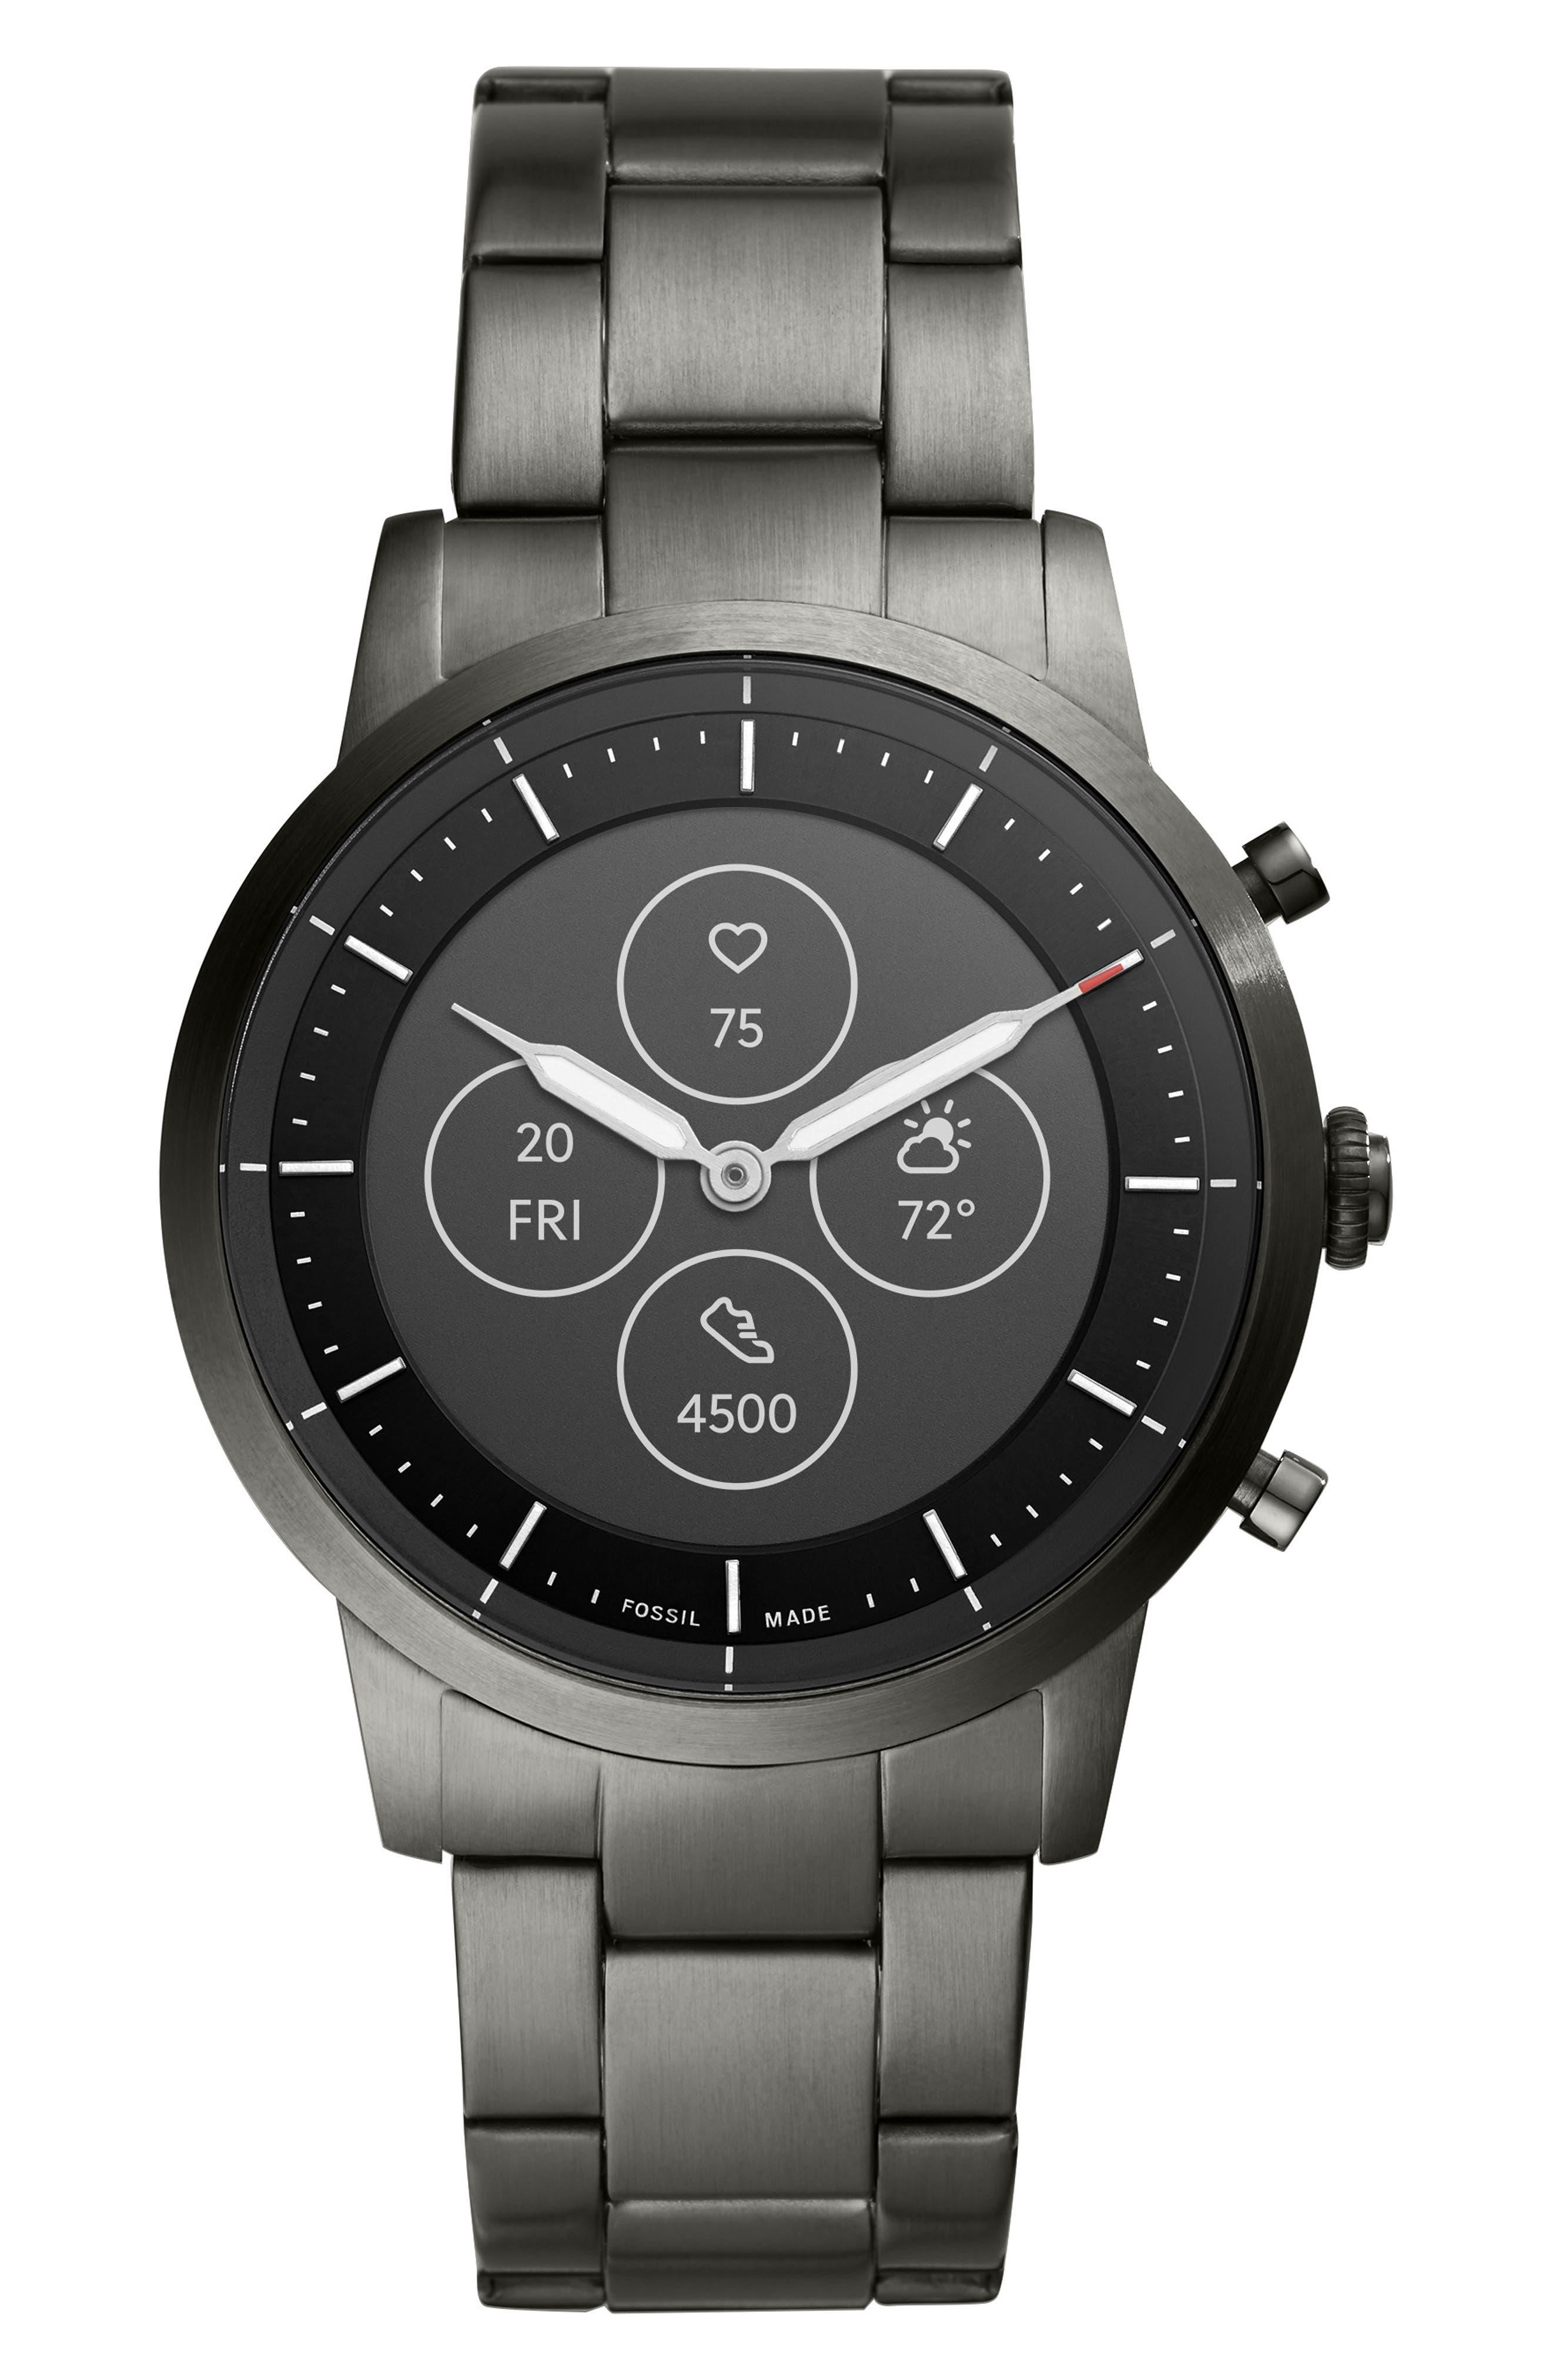 Collider Hybrid Hr Chronograph Smart Bracelet Watch